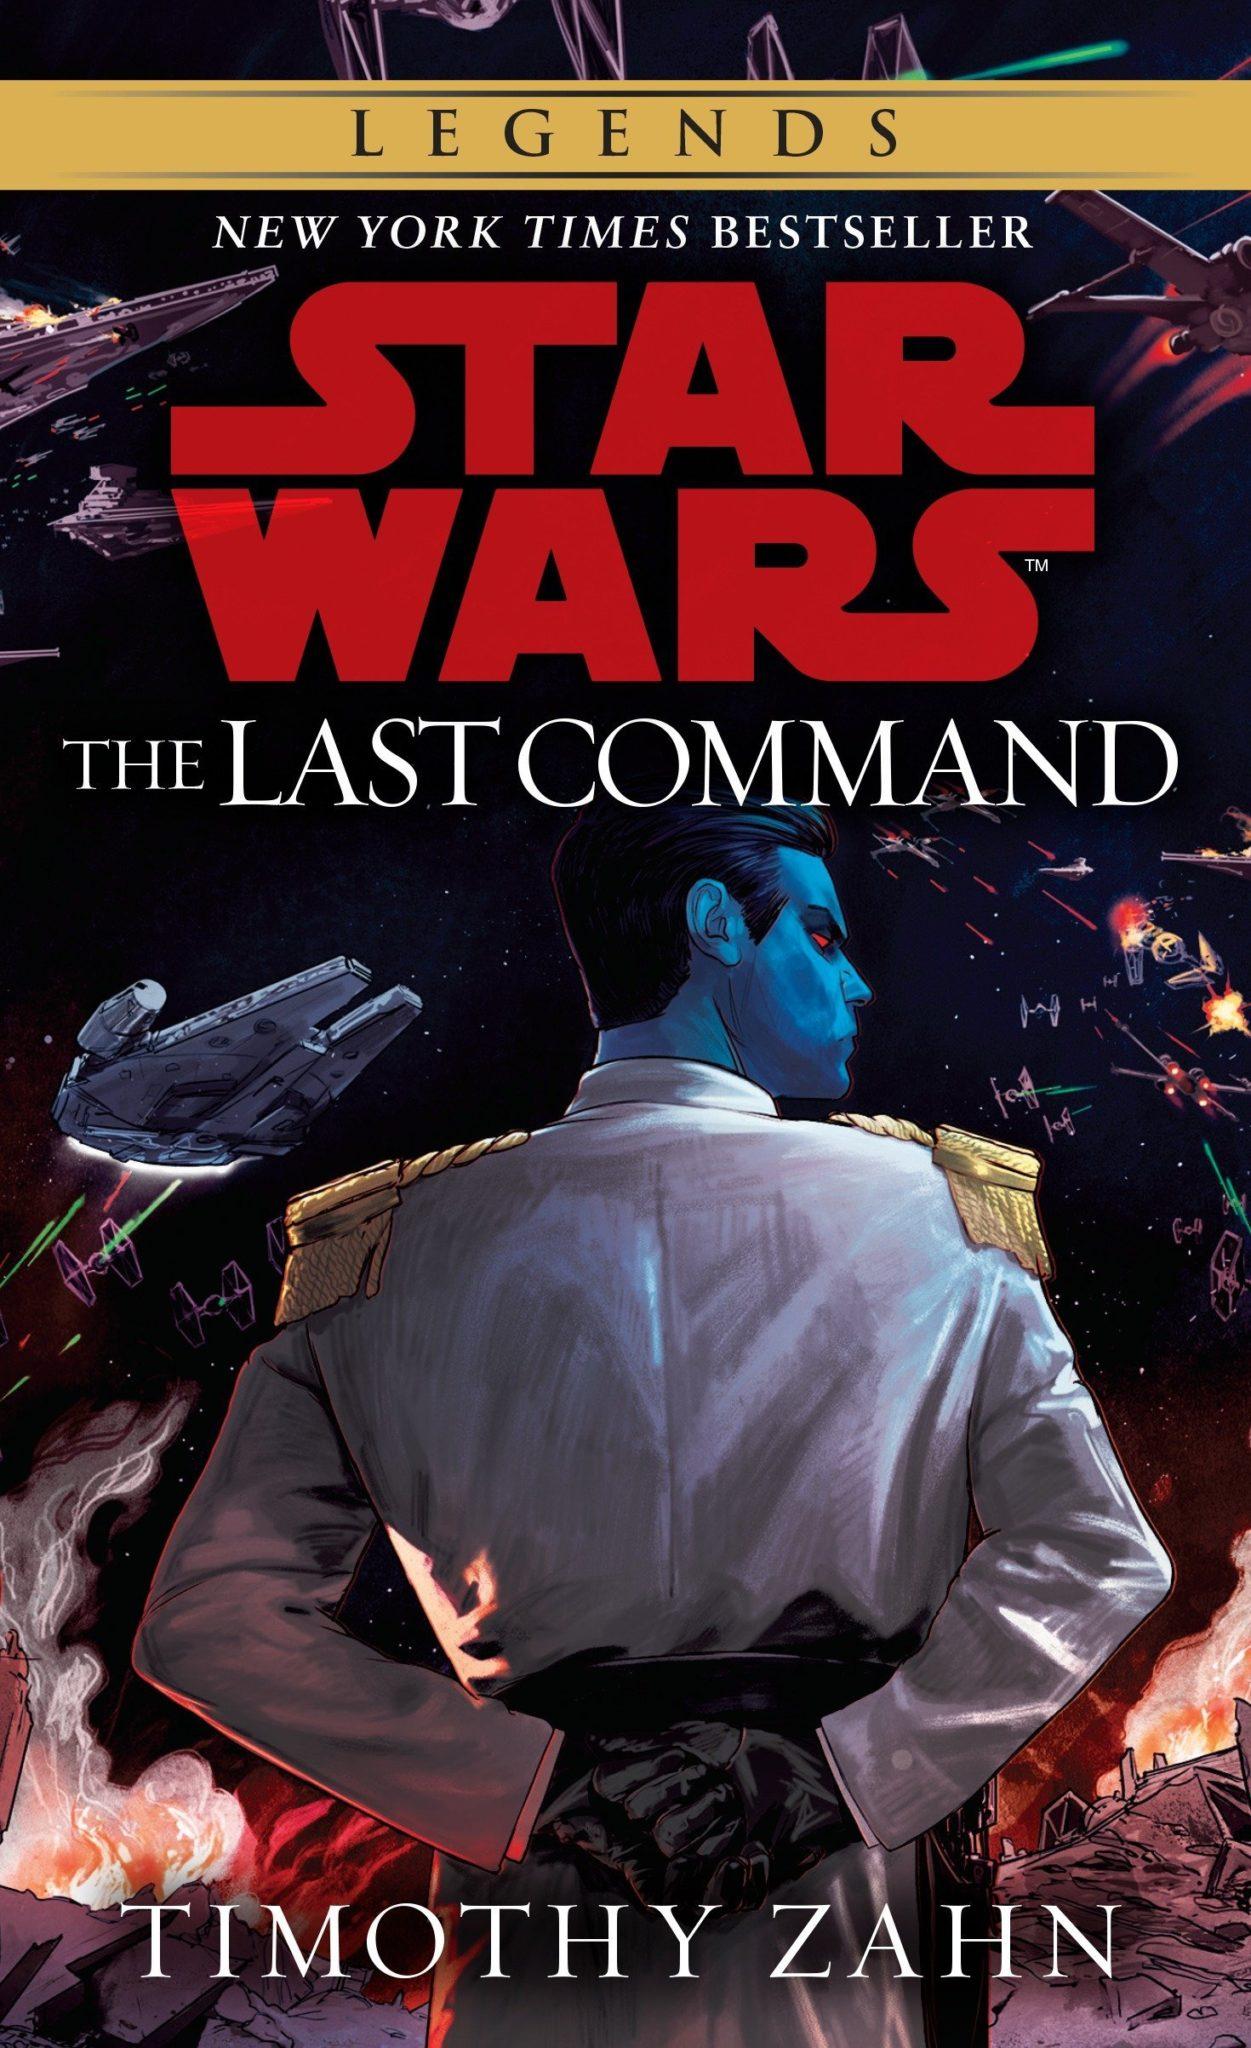 Star Wars books 4